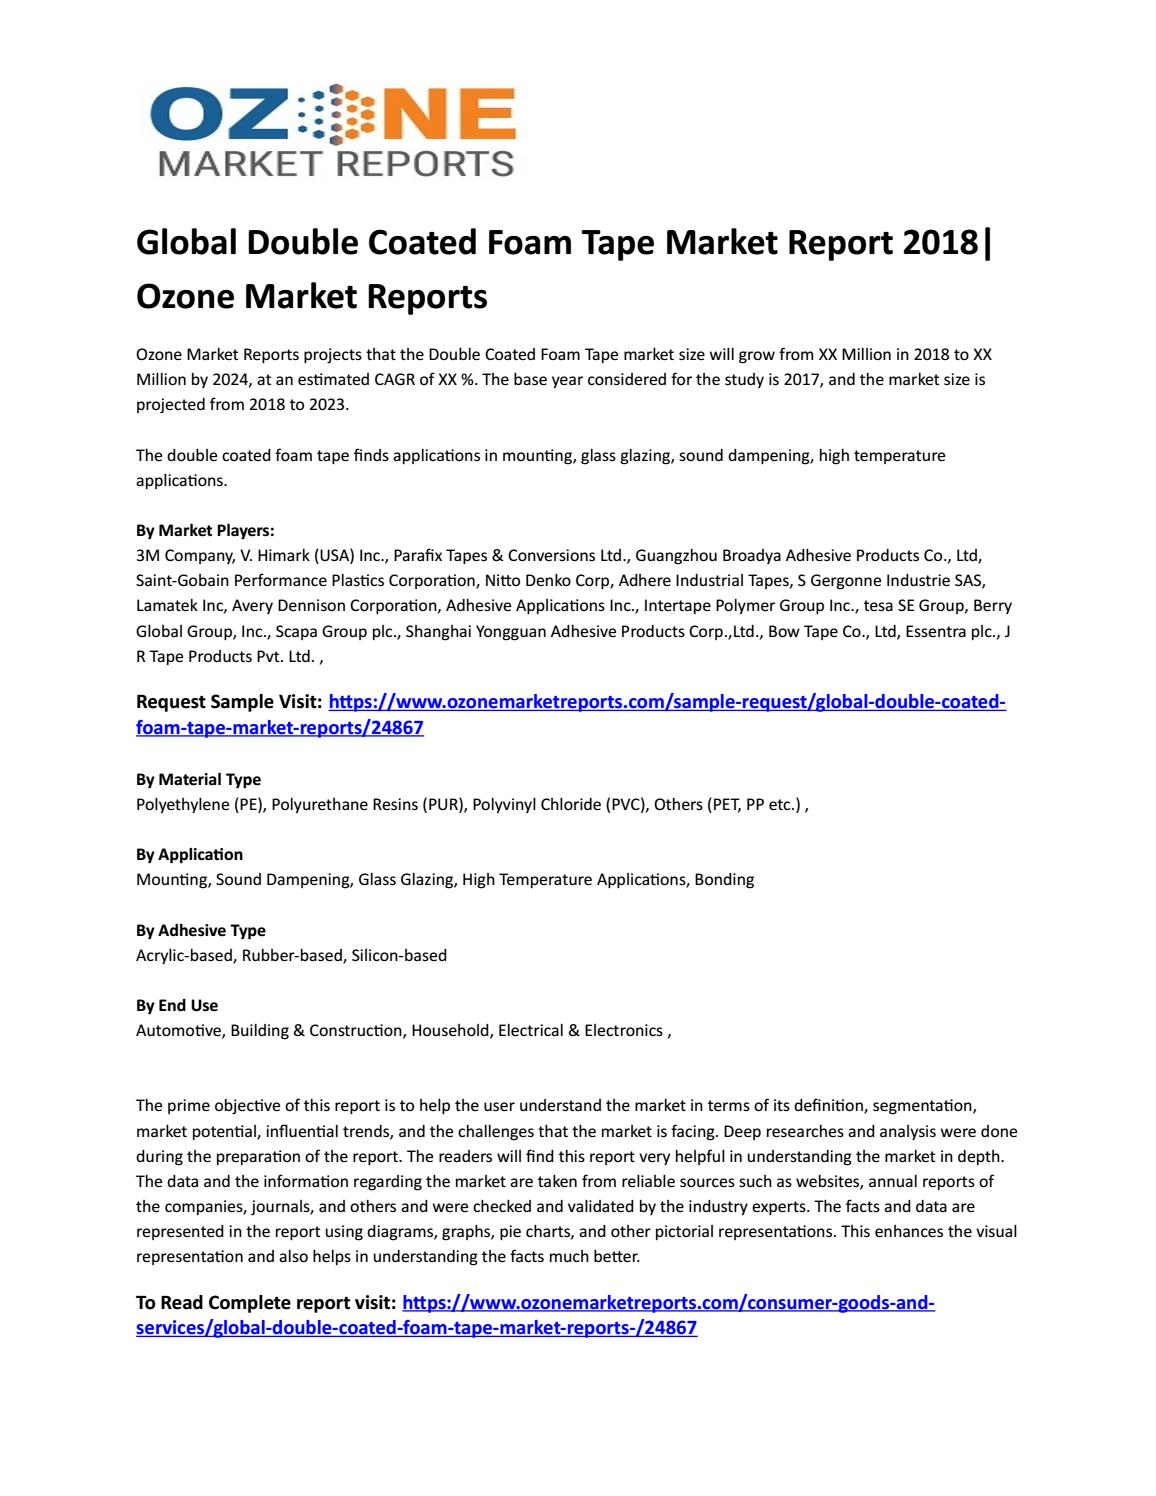 Global Double Coated Foam Tape Market Report 2018|Ozone